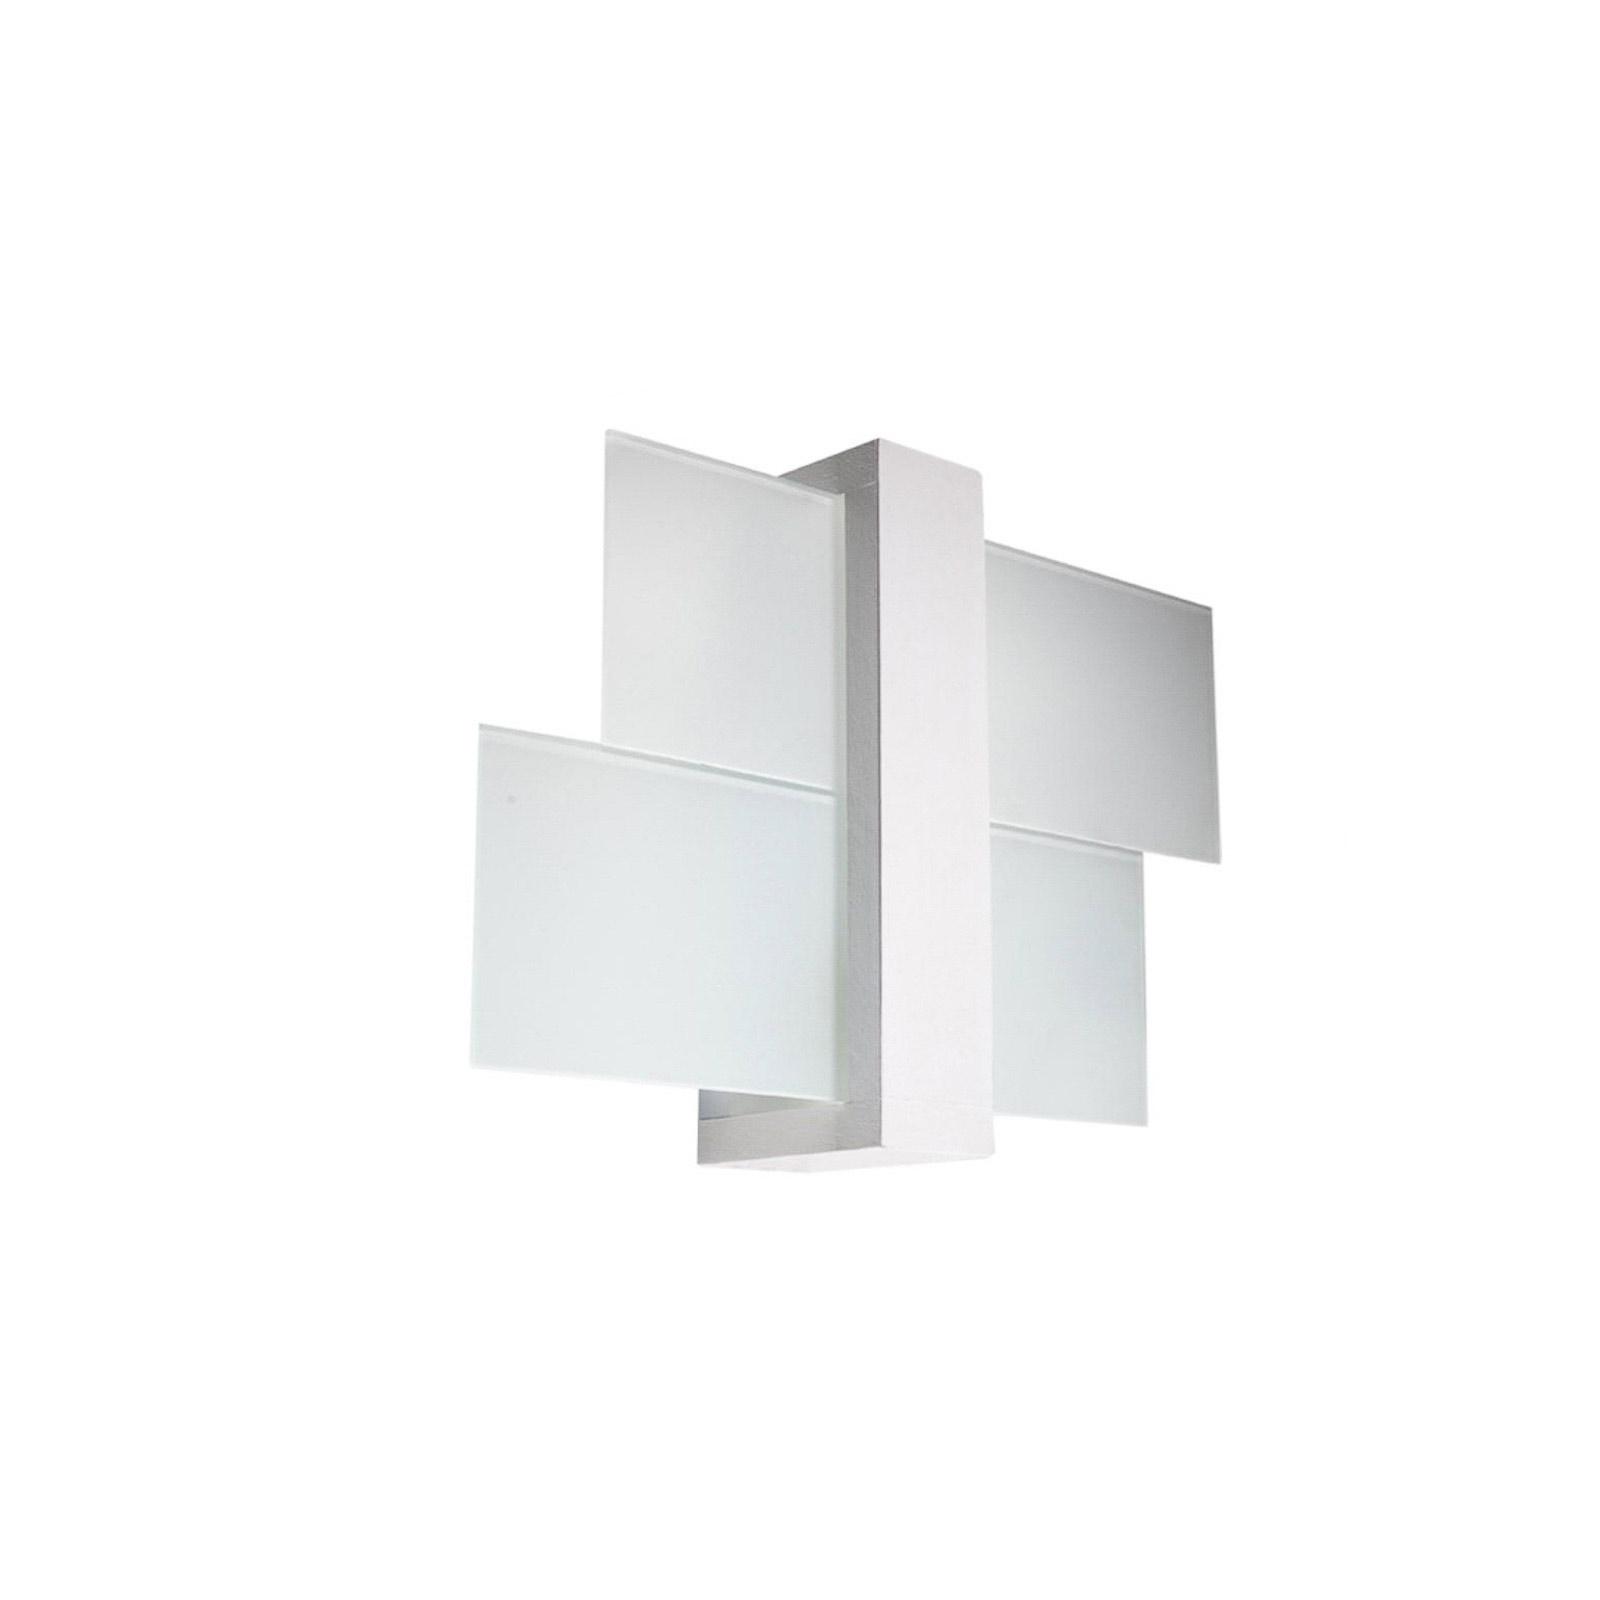 Wandleuchte Shifted 1, Glas, weiß